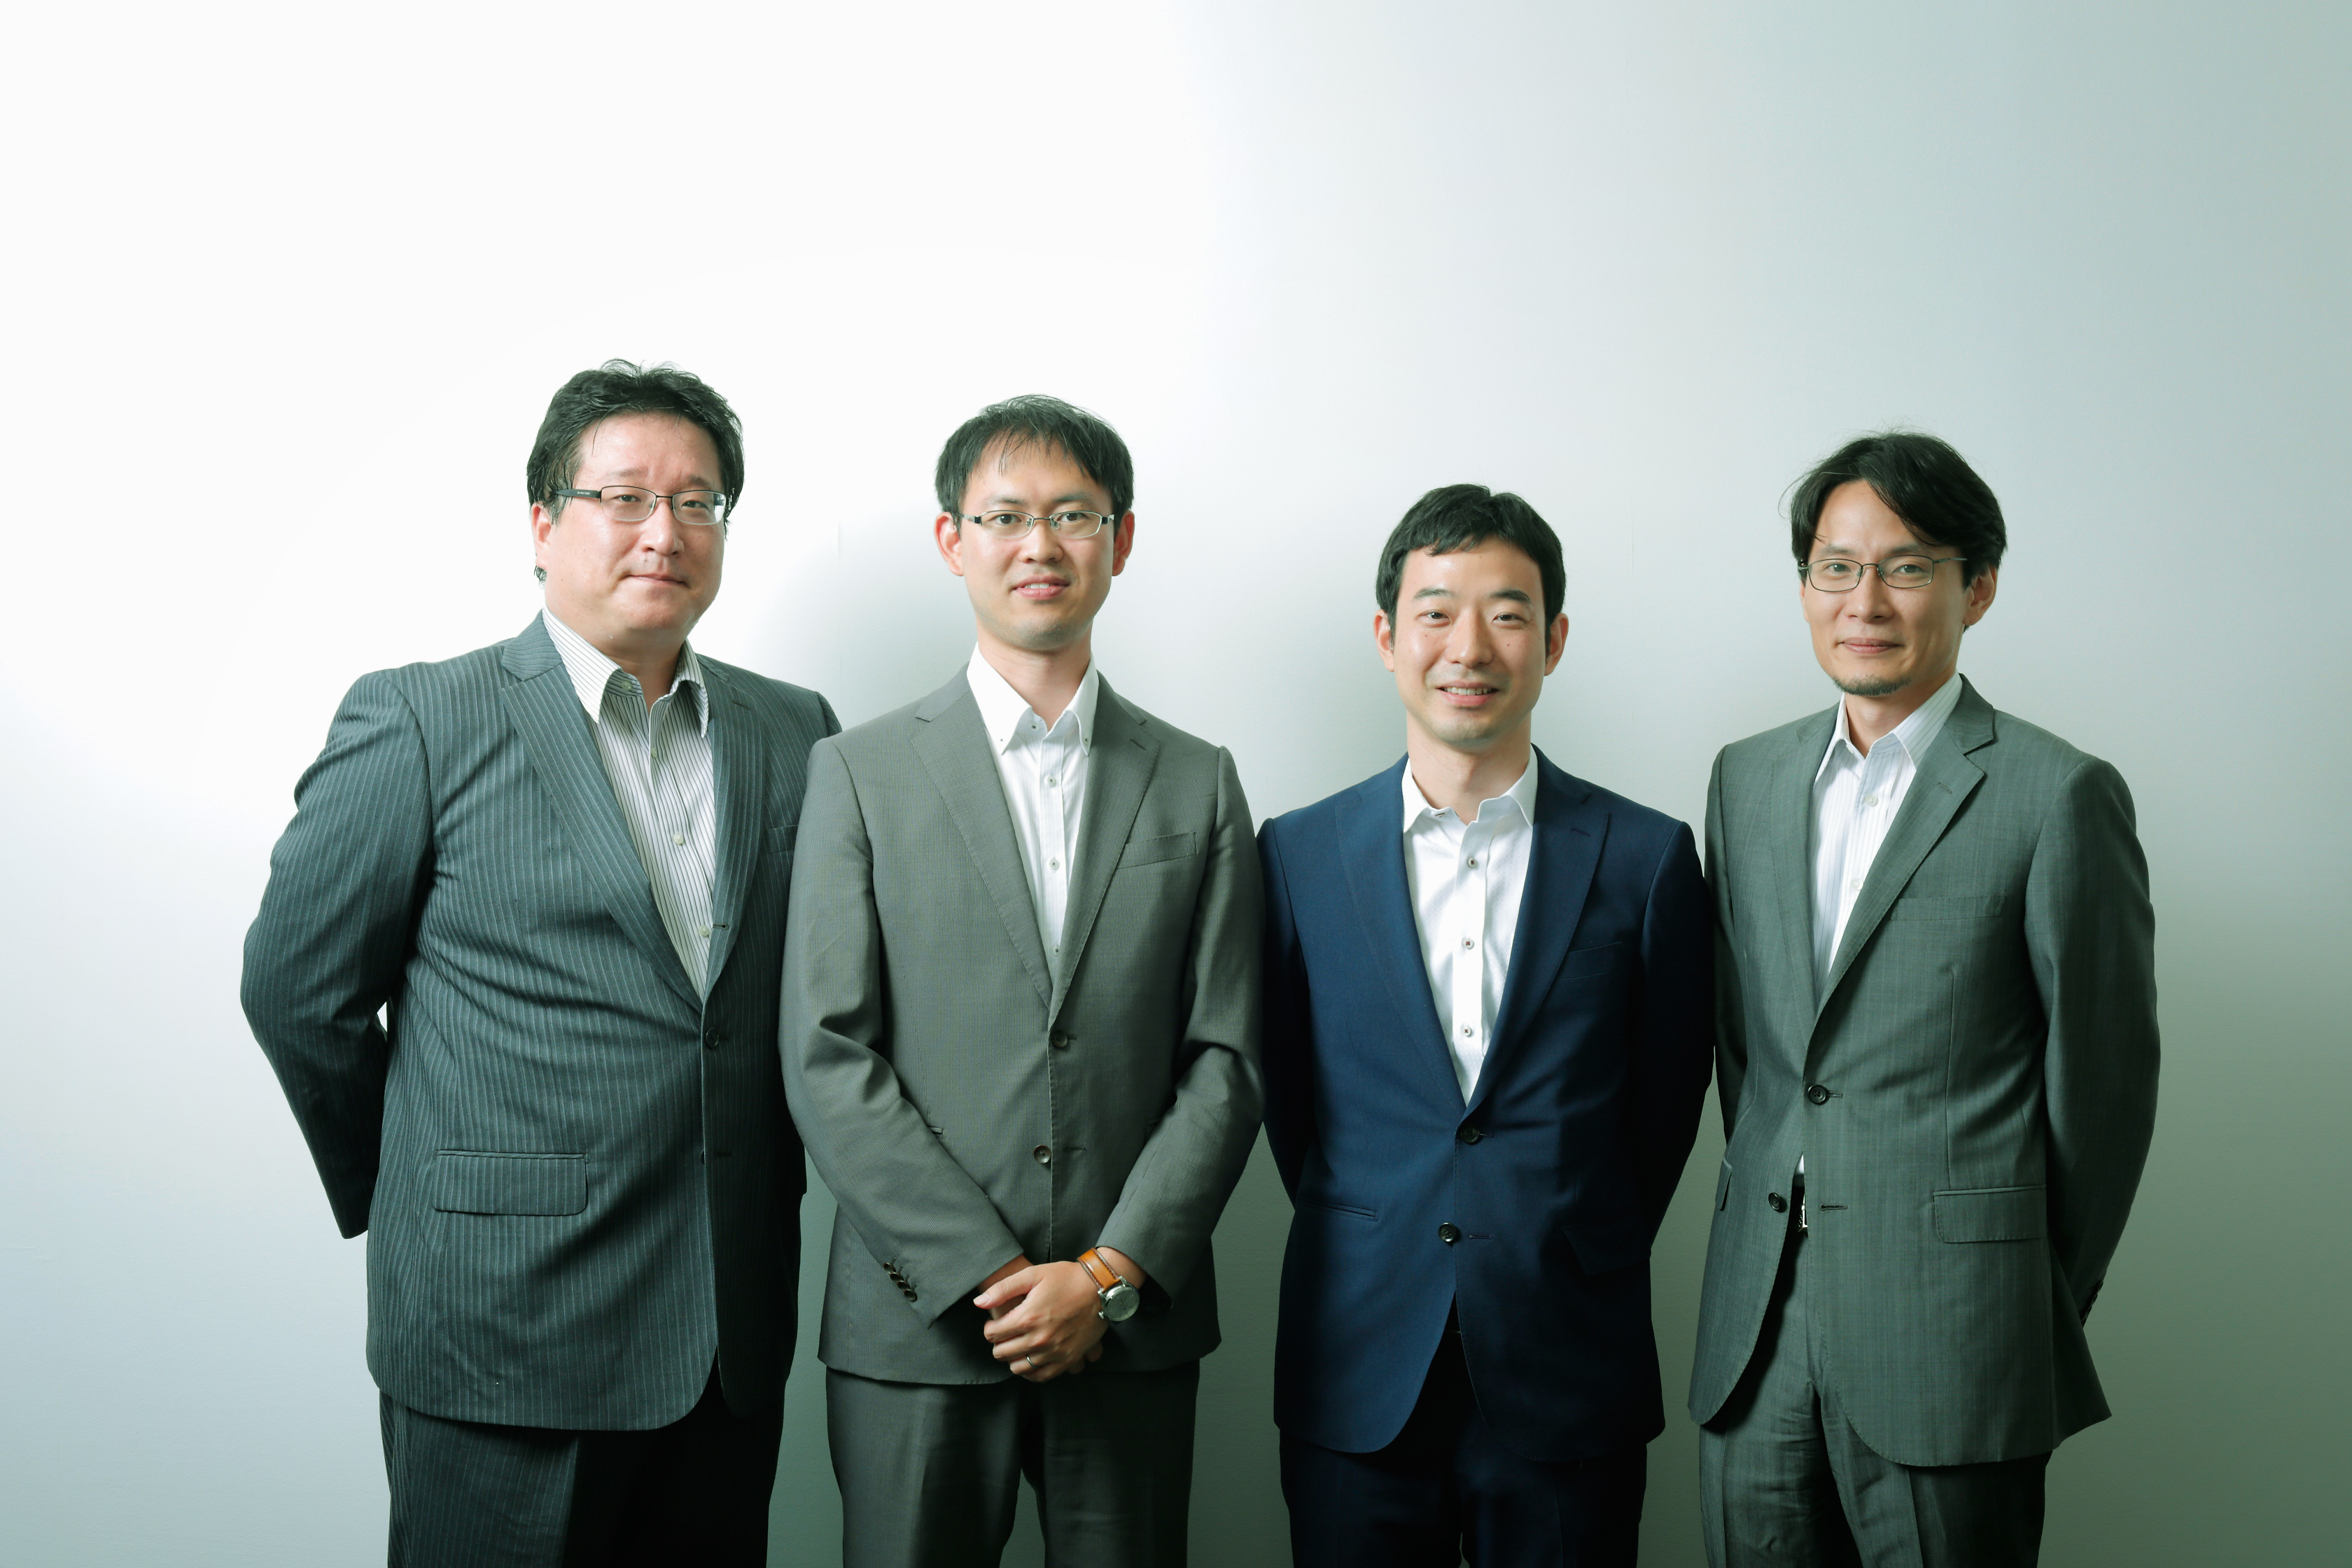 日本総合研究所研究員4名プロフィール写真